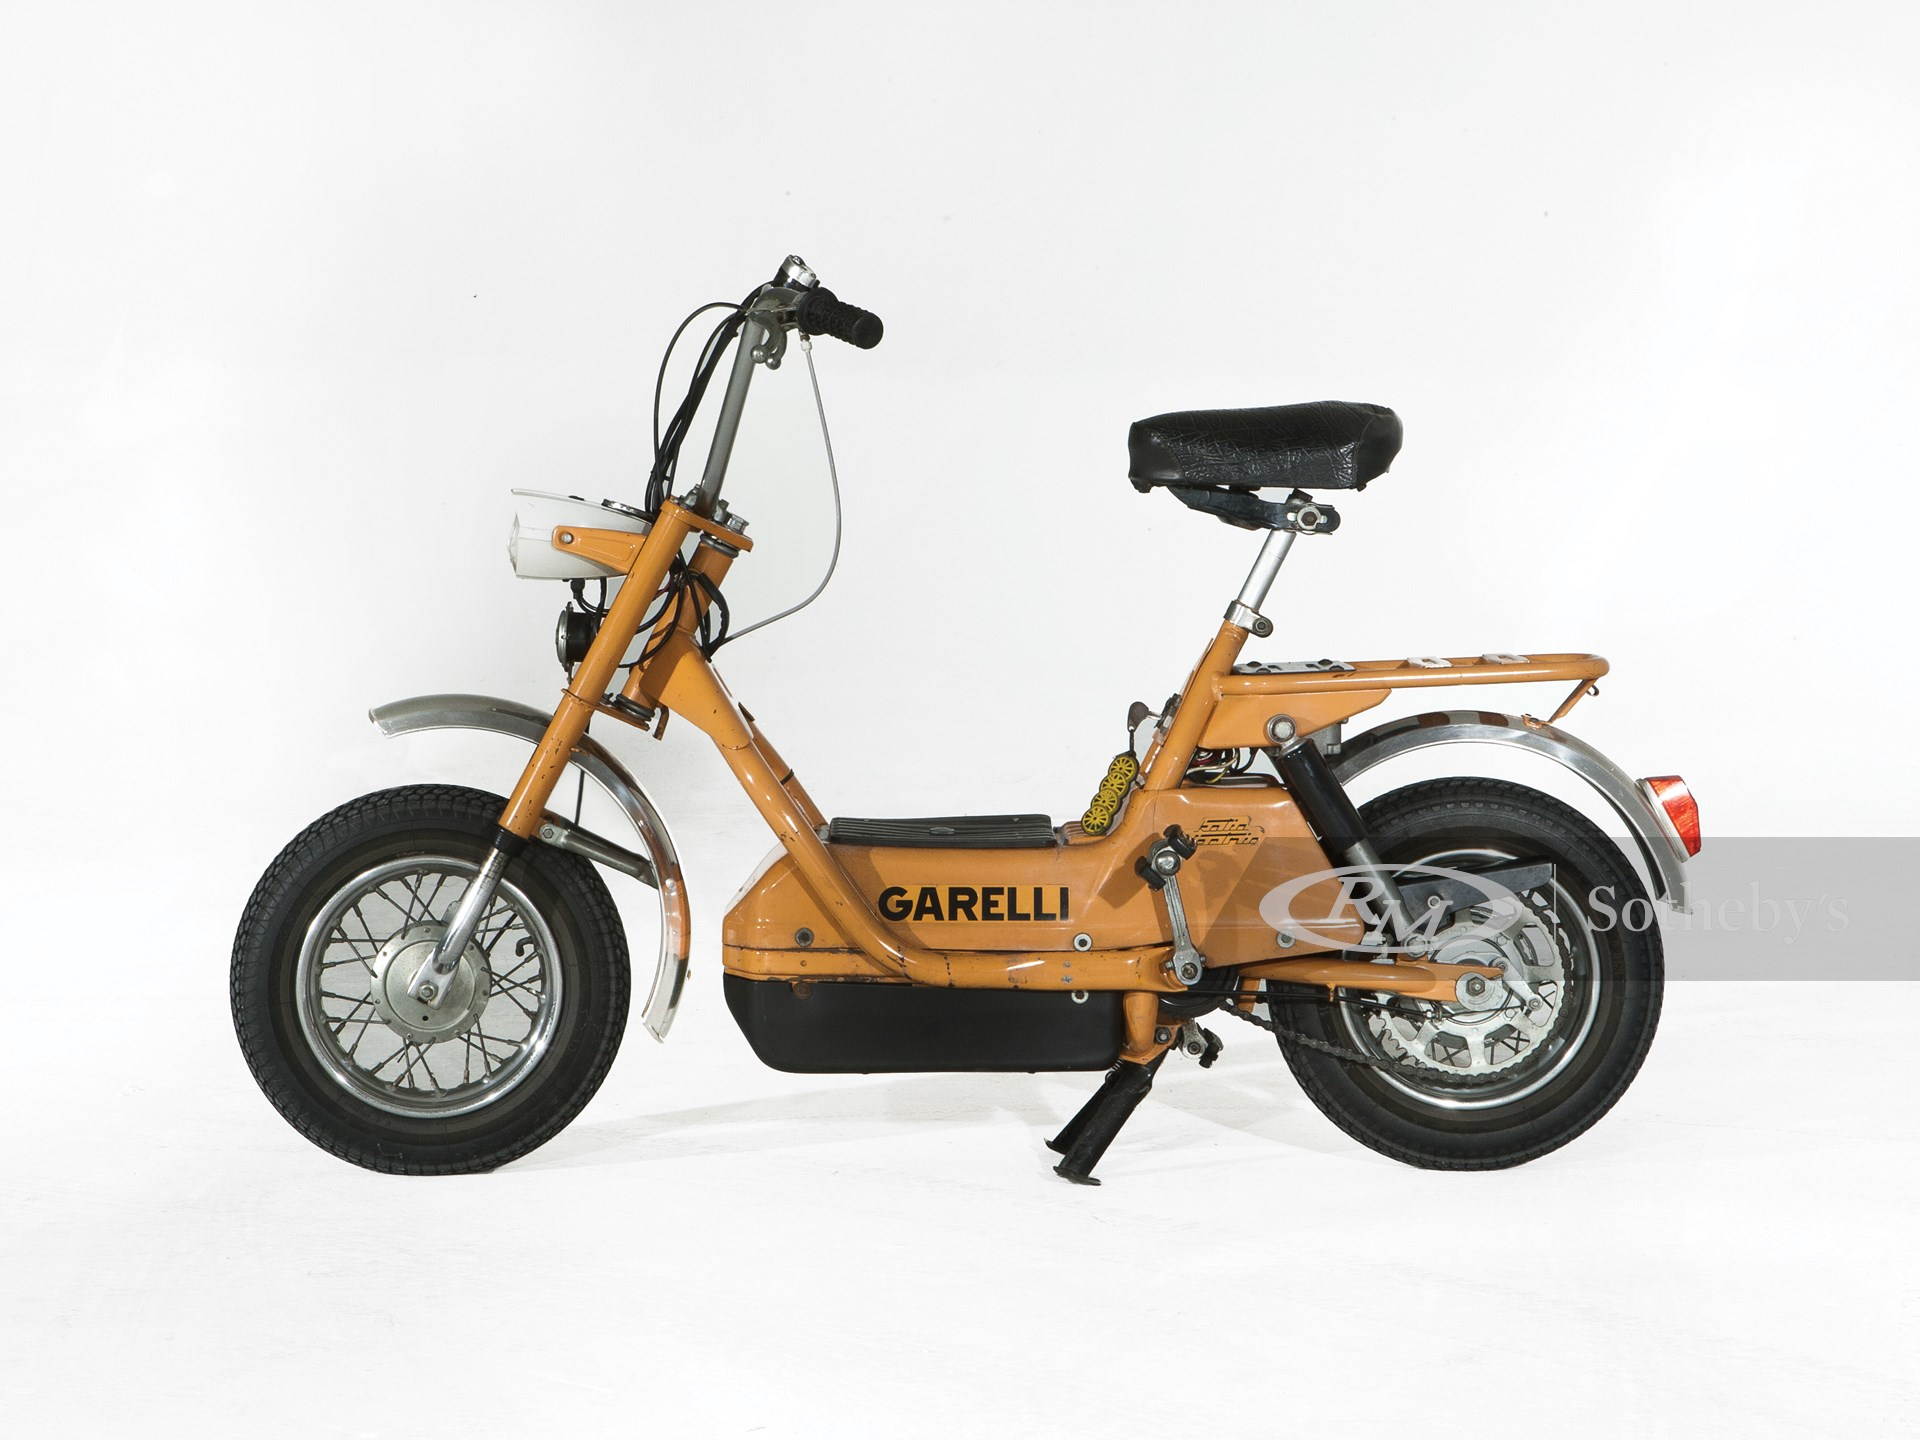 1974 Agrati-Garelli Katia MS